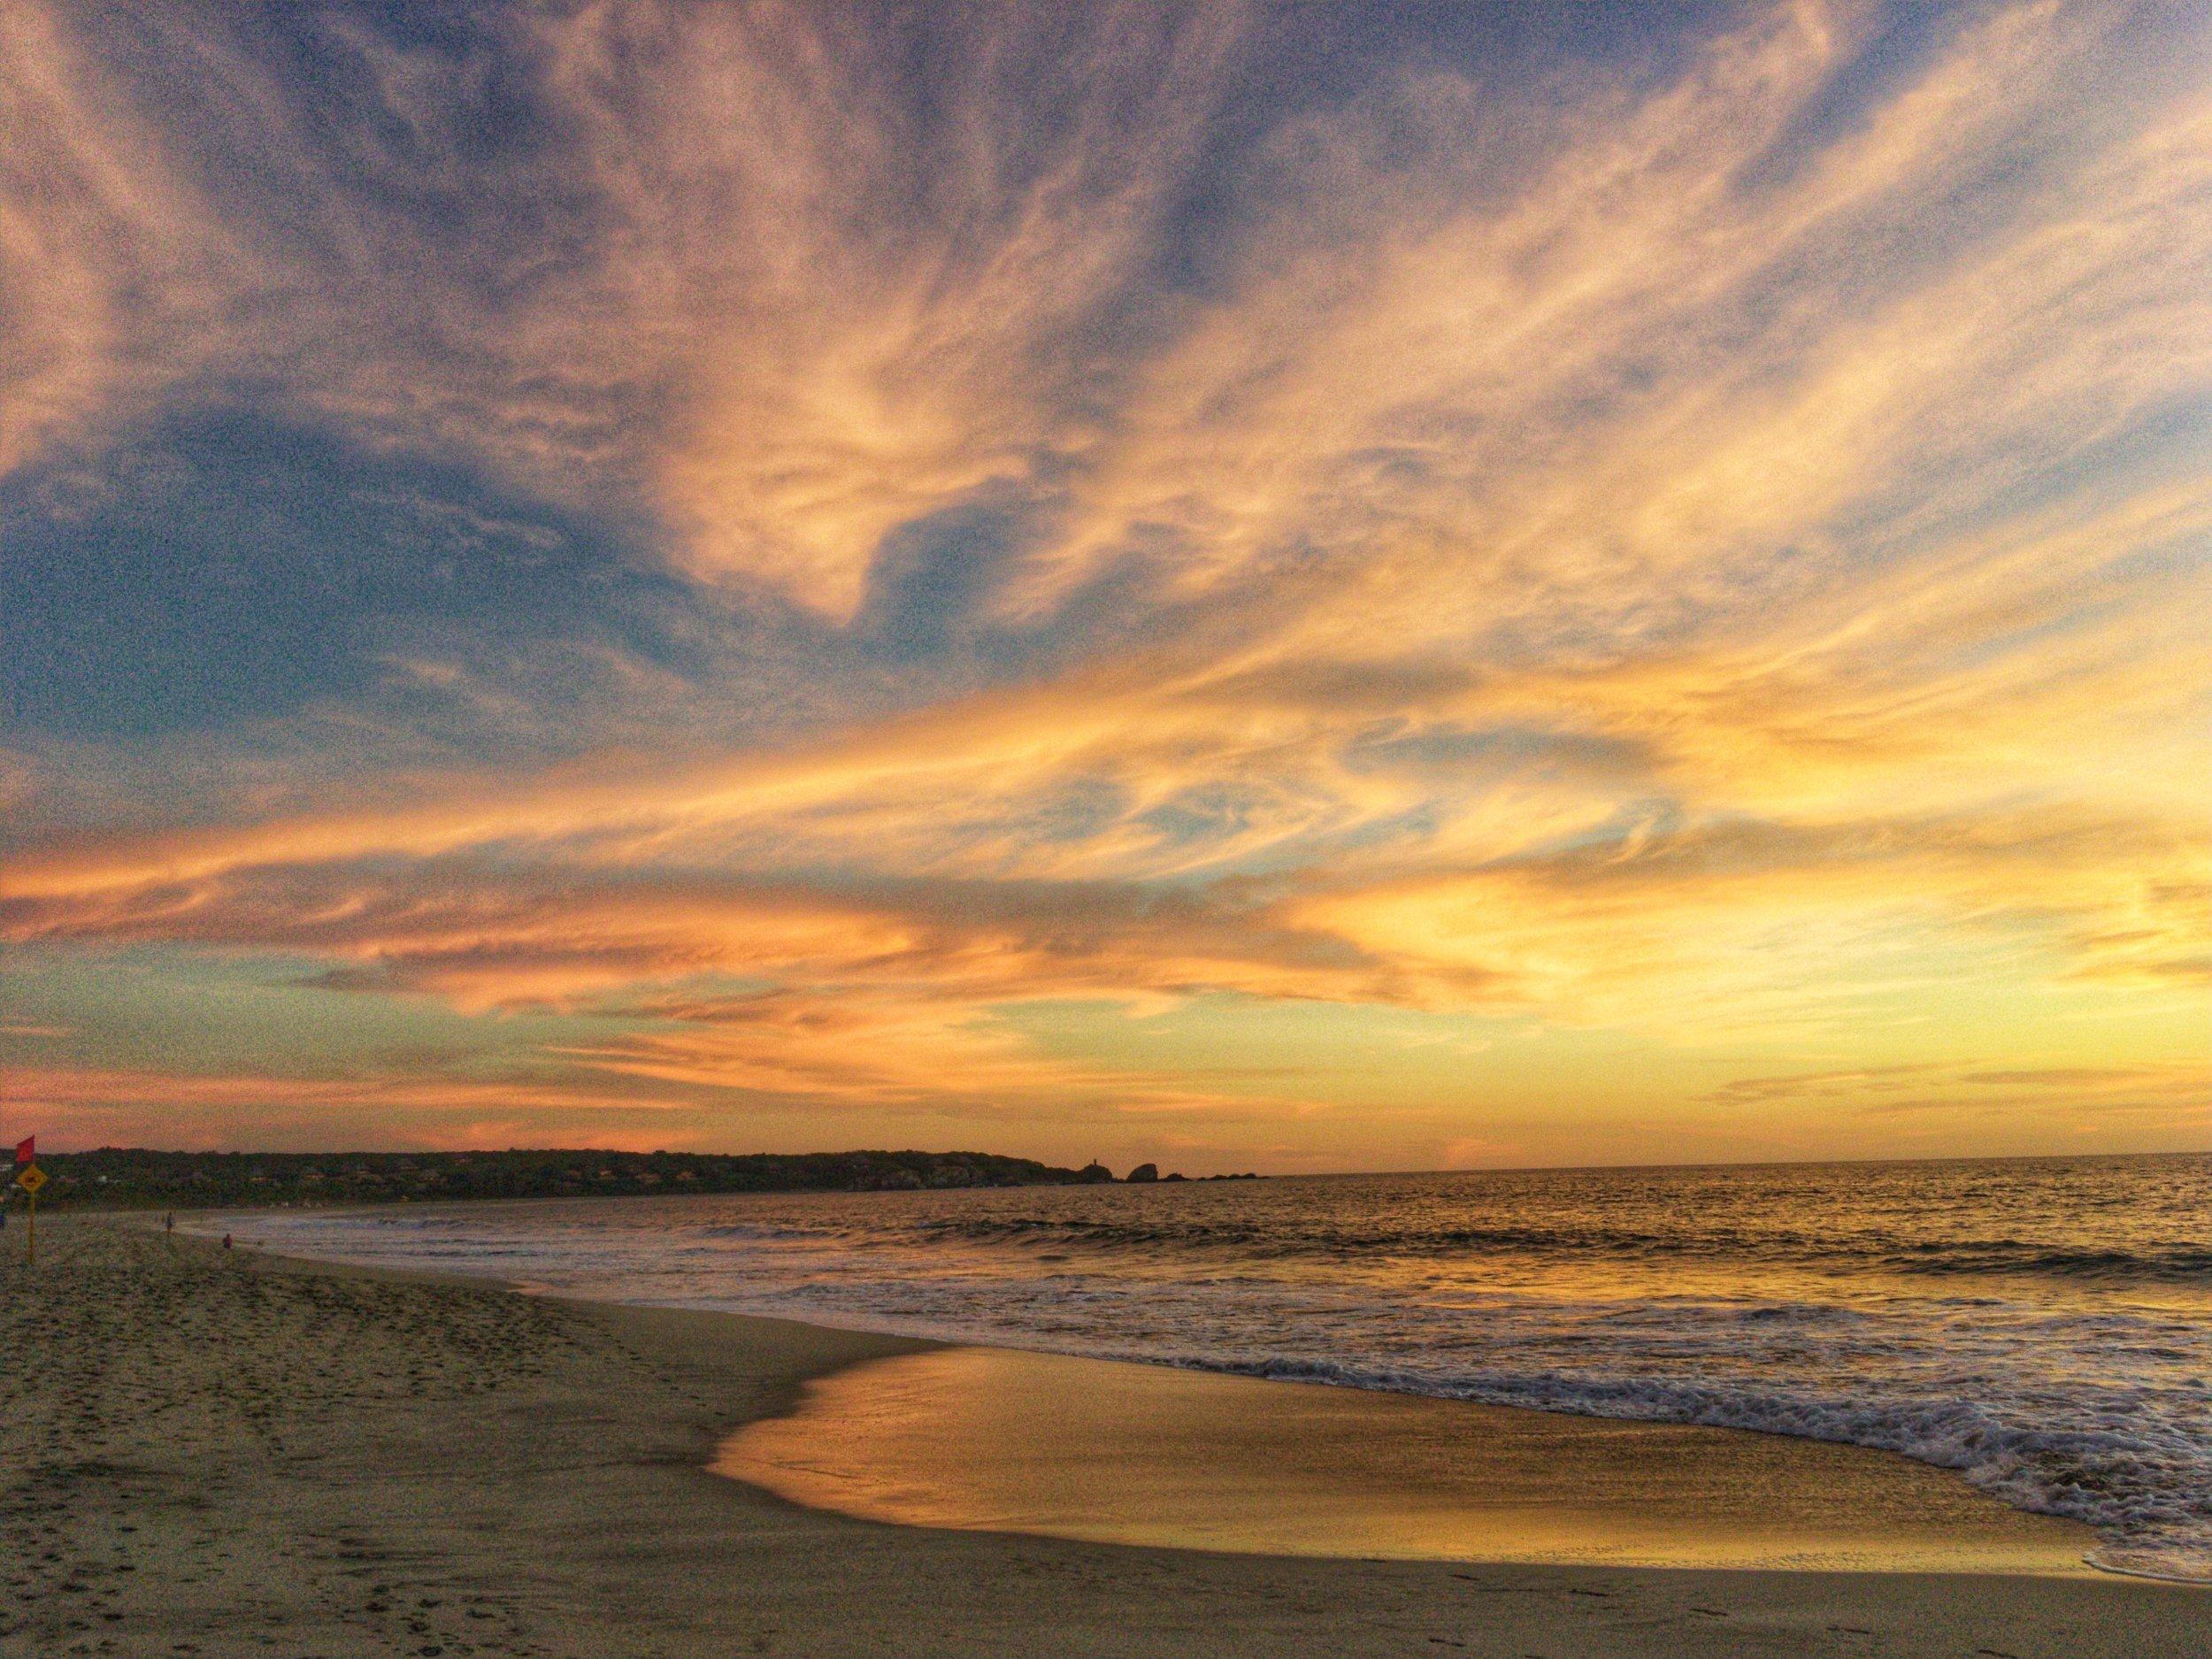 Playa Zicatela beach sunset